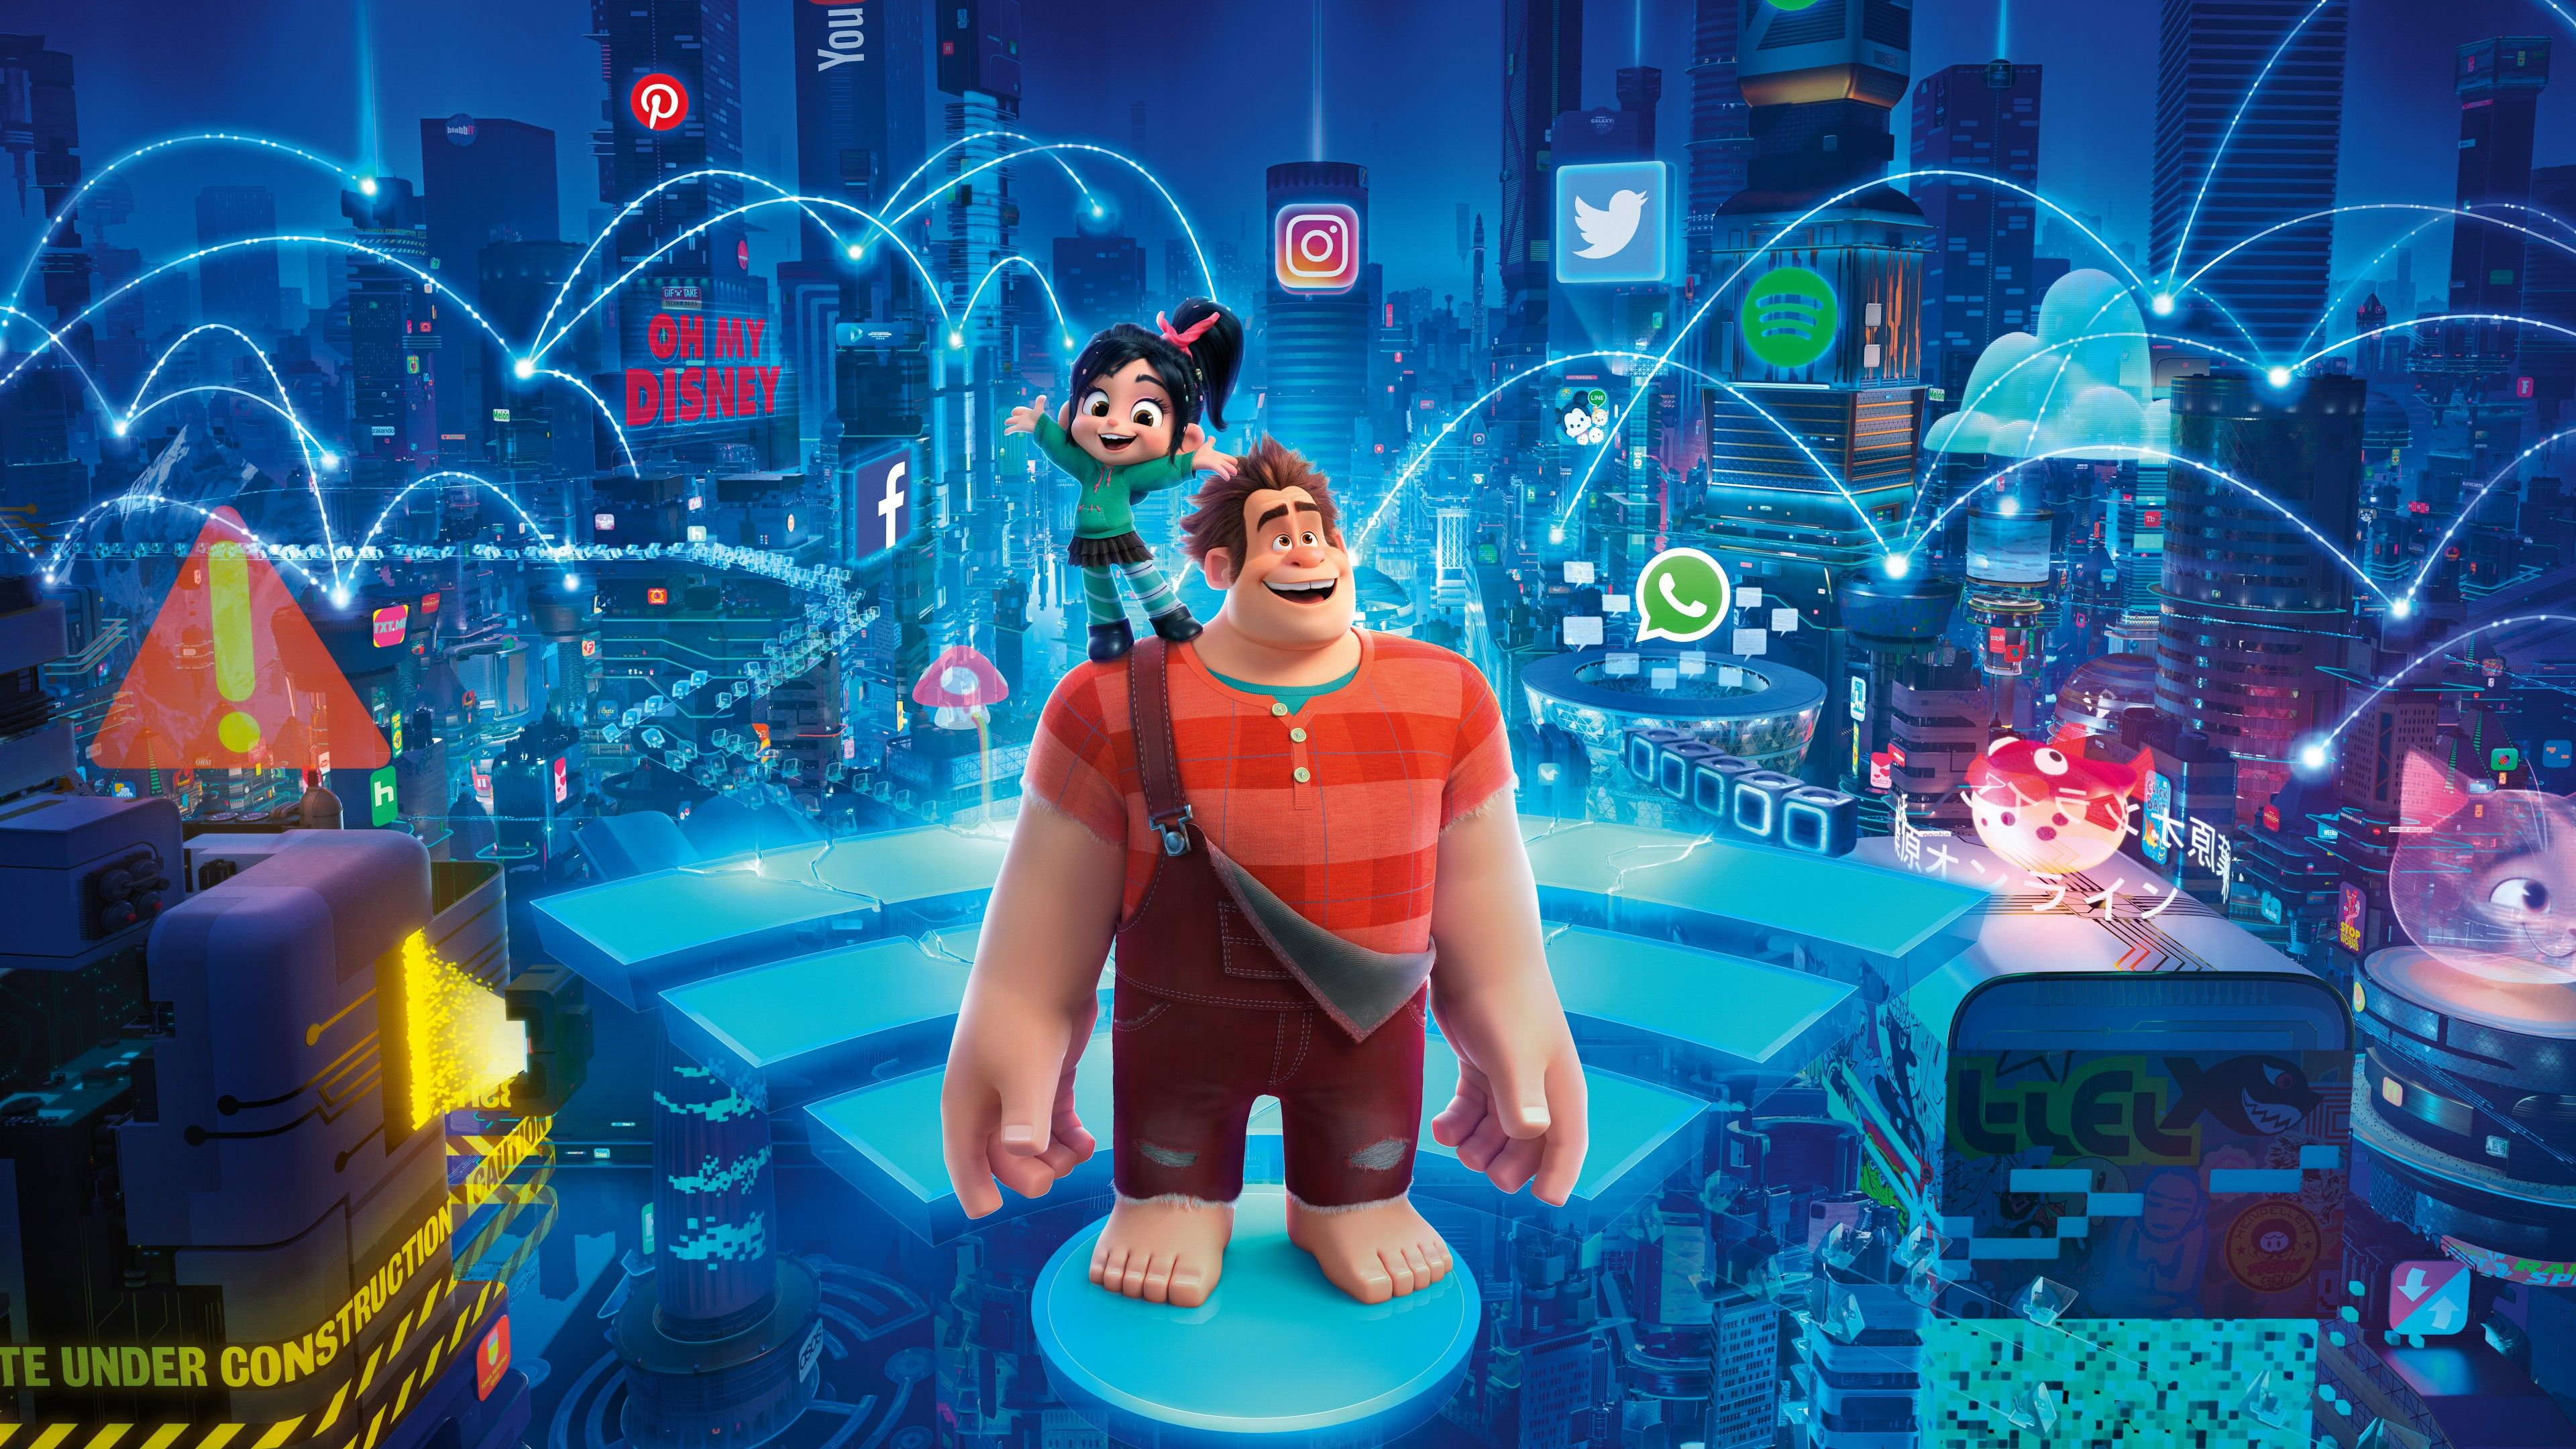 Ralph 2 | Movies | Disney films, Streaming movies, Movies online